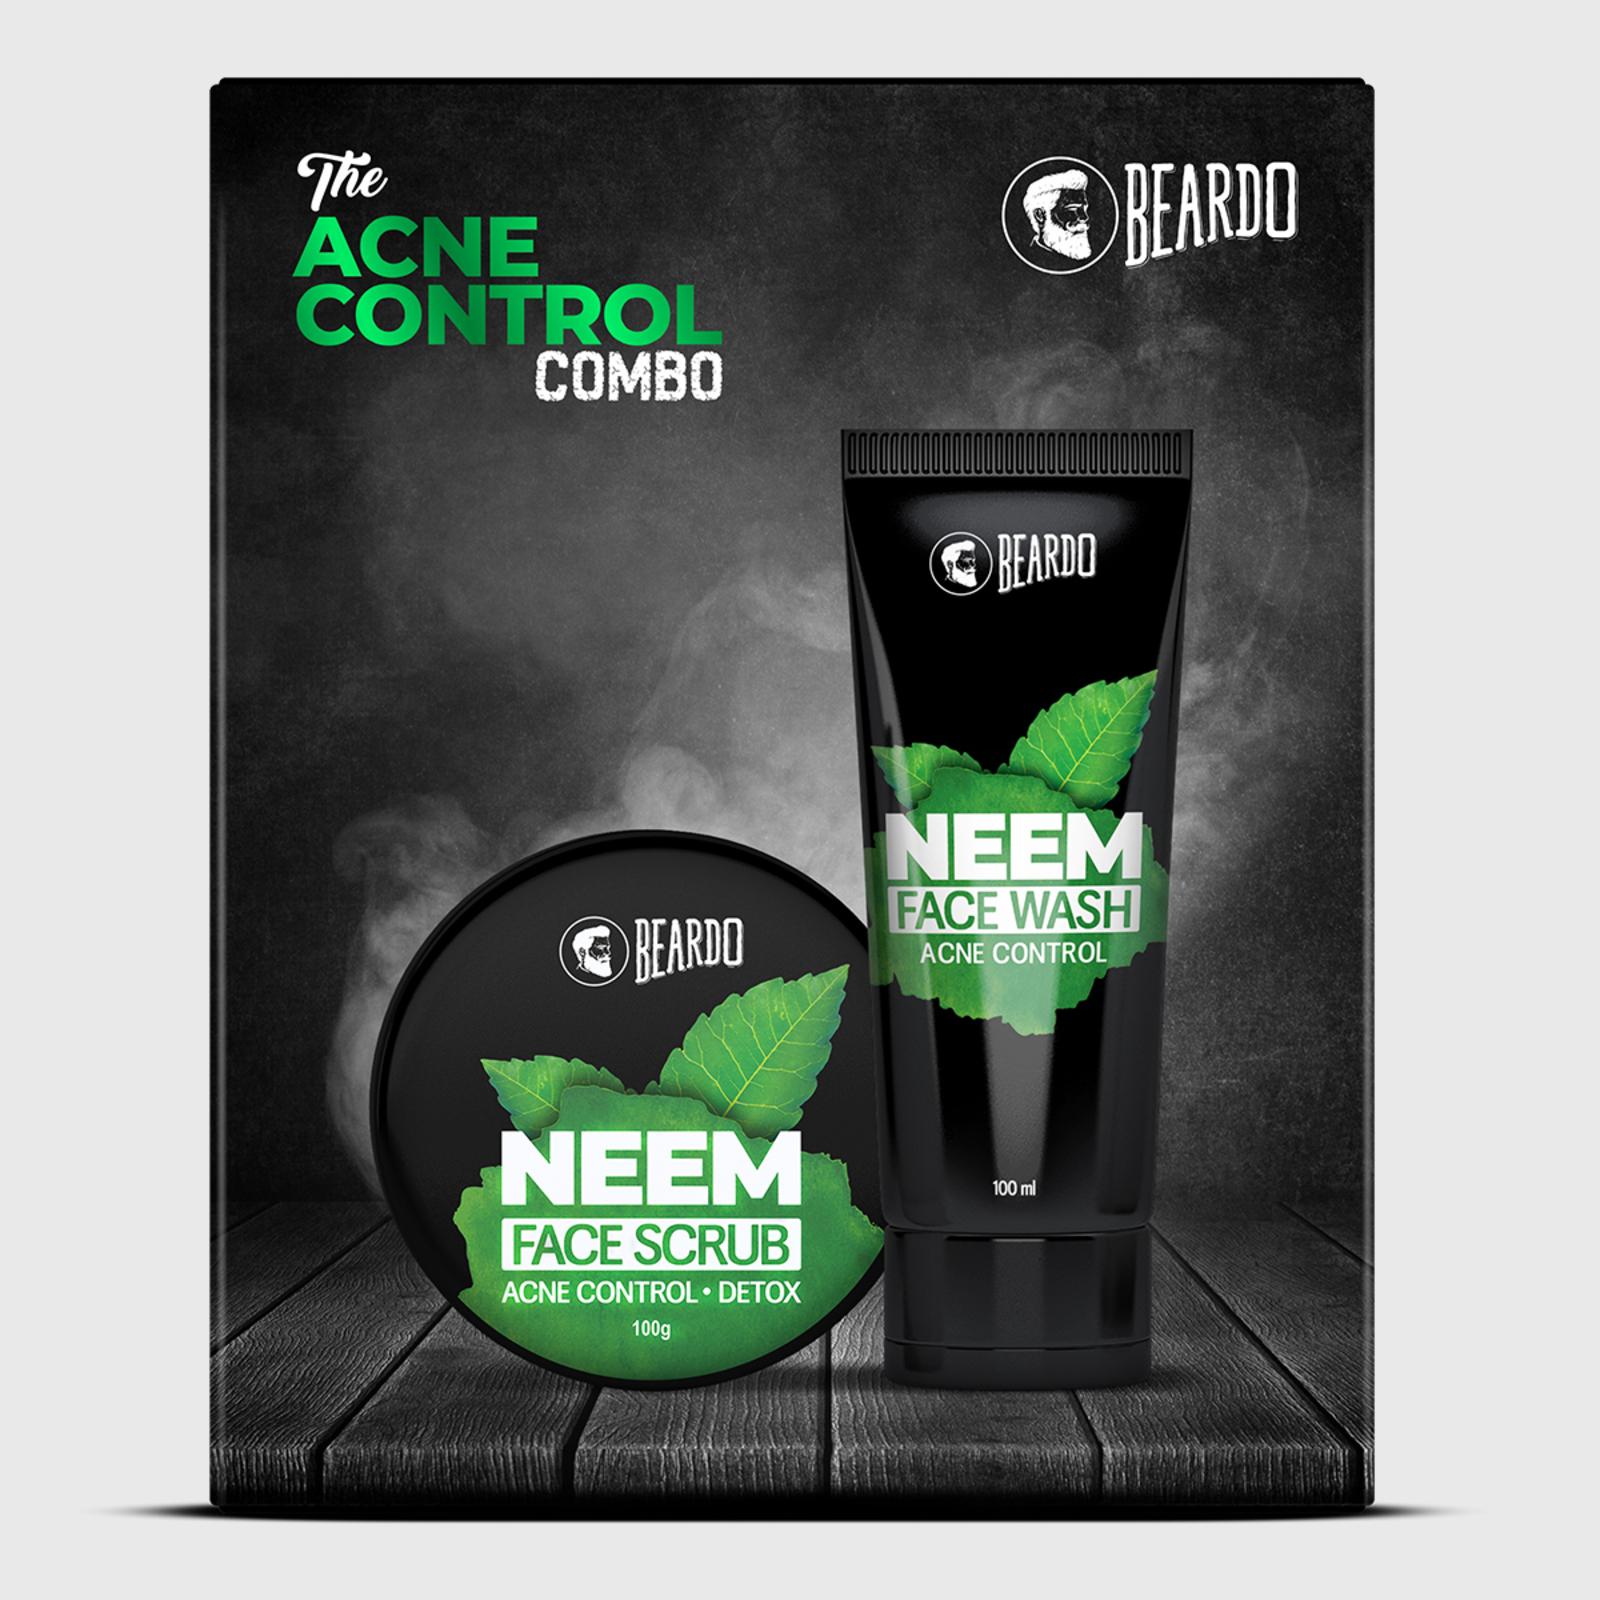 Beardo The Acne Control Neem Combo for Men